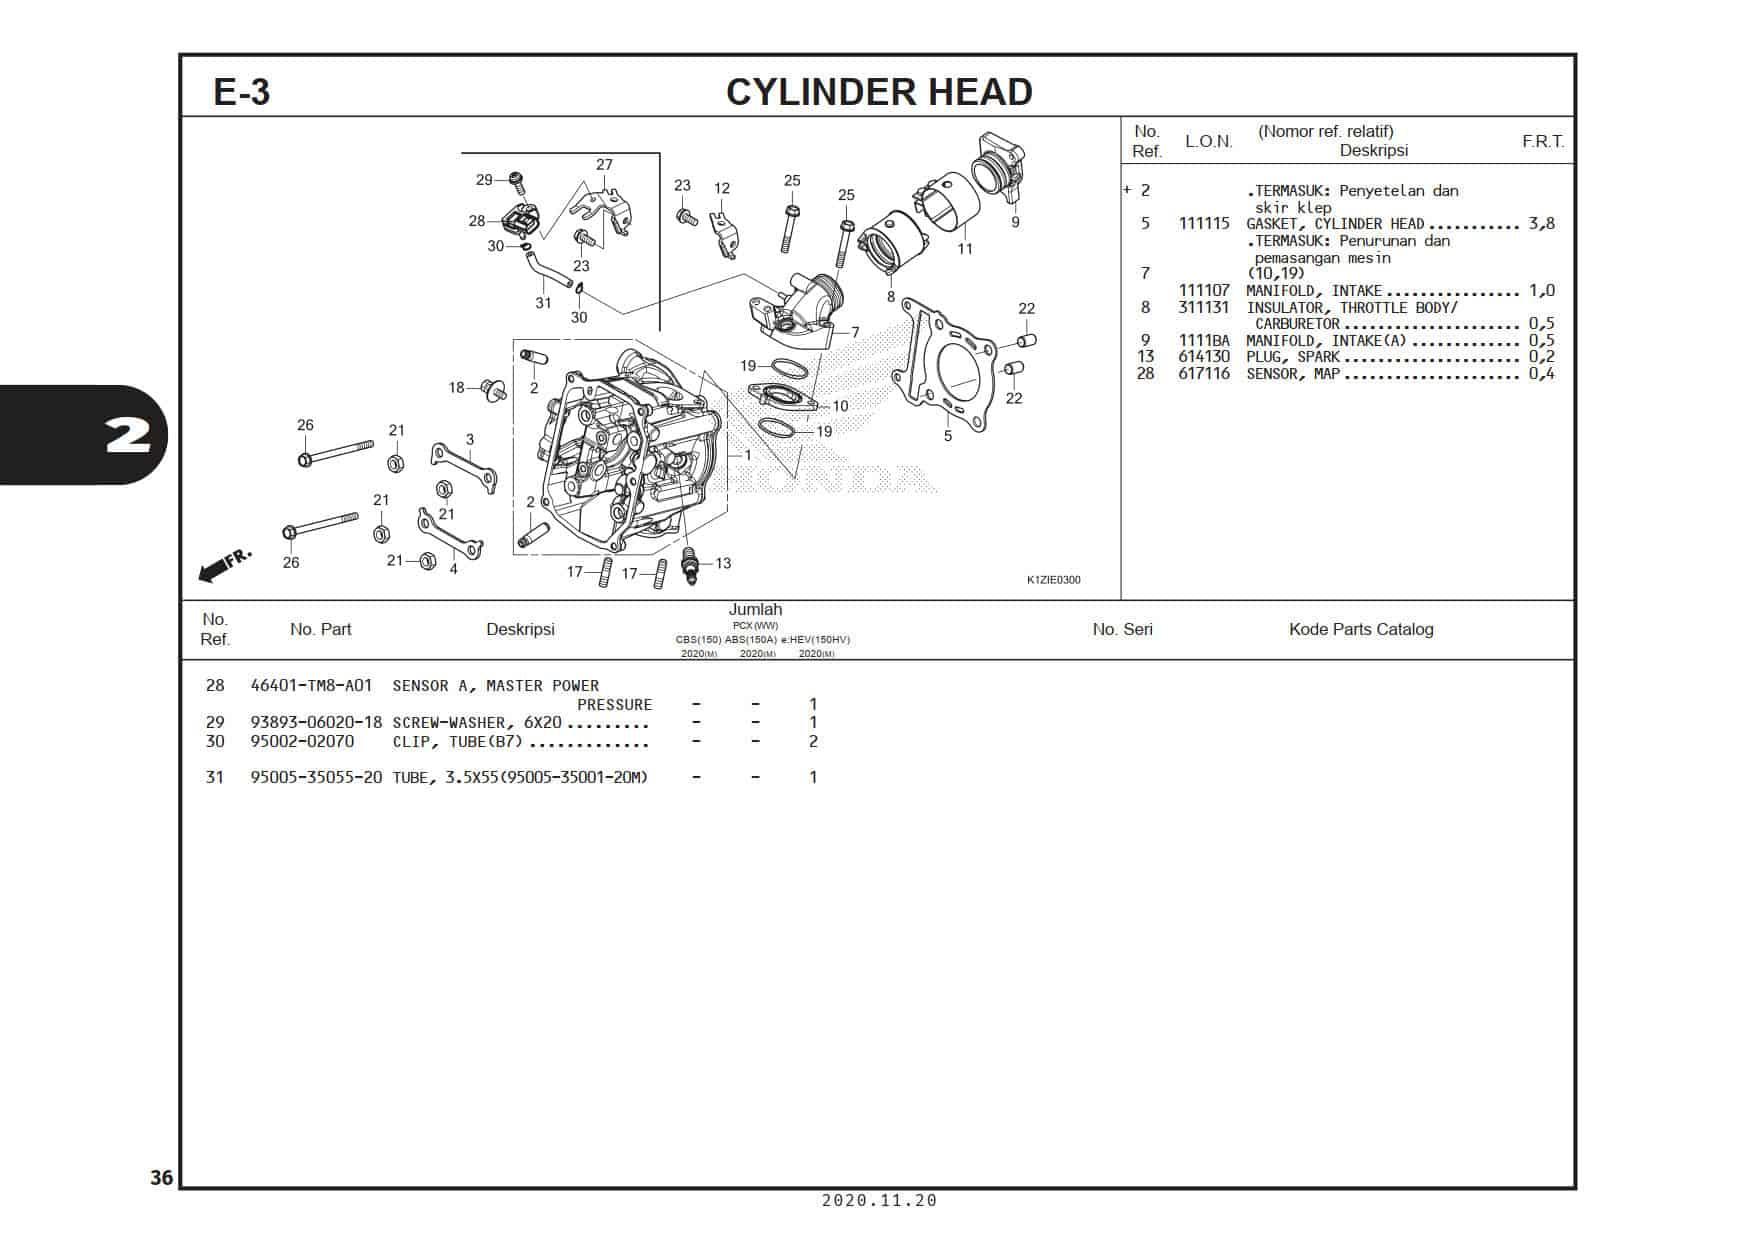 E-3 Cylinder Head